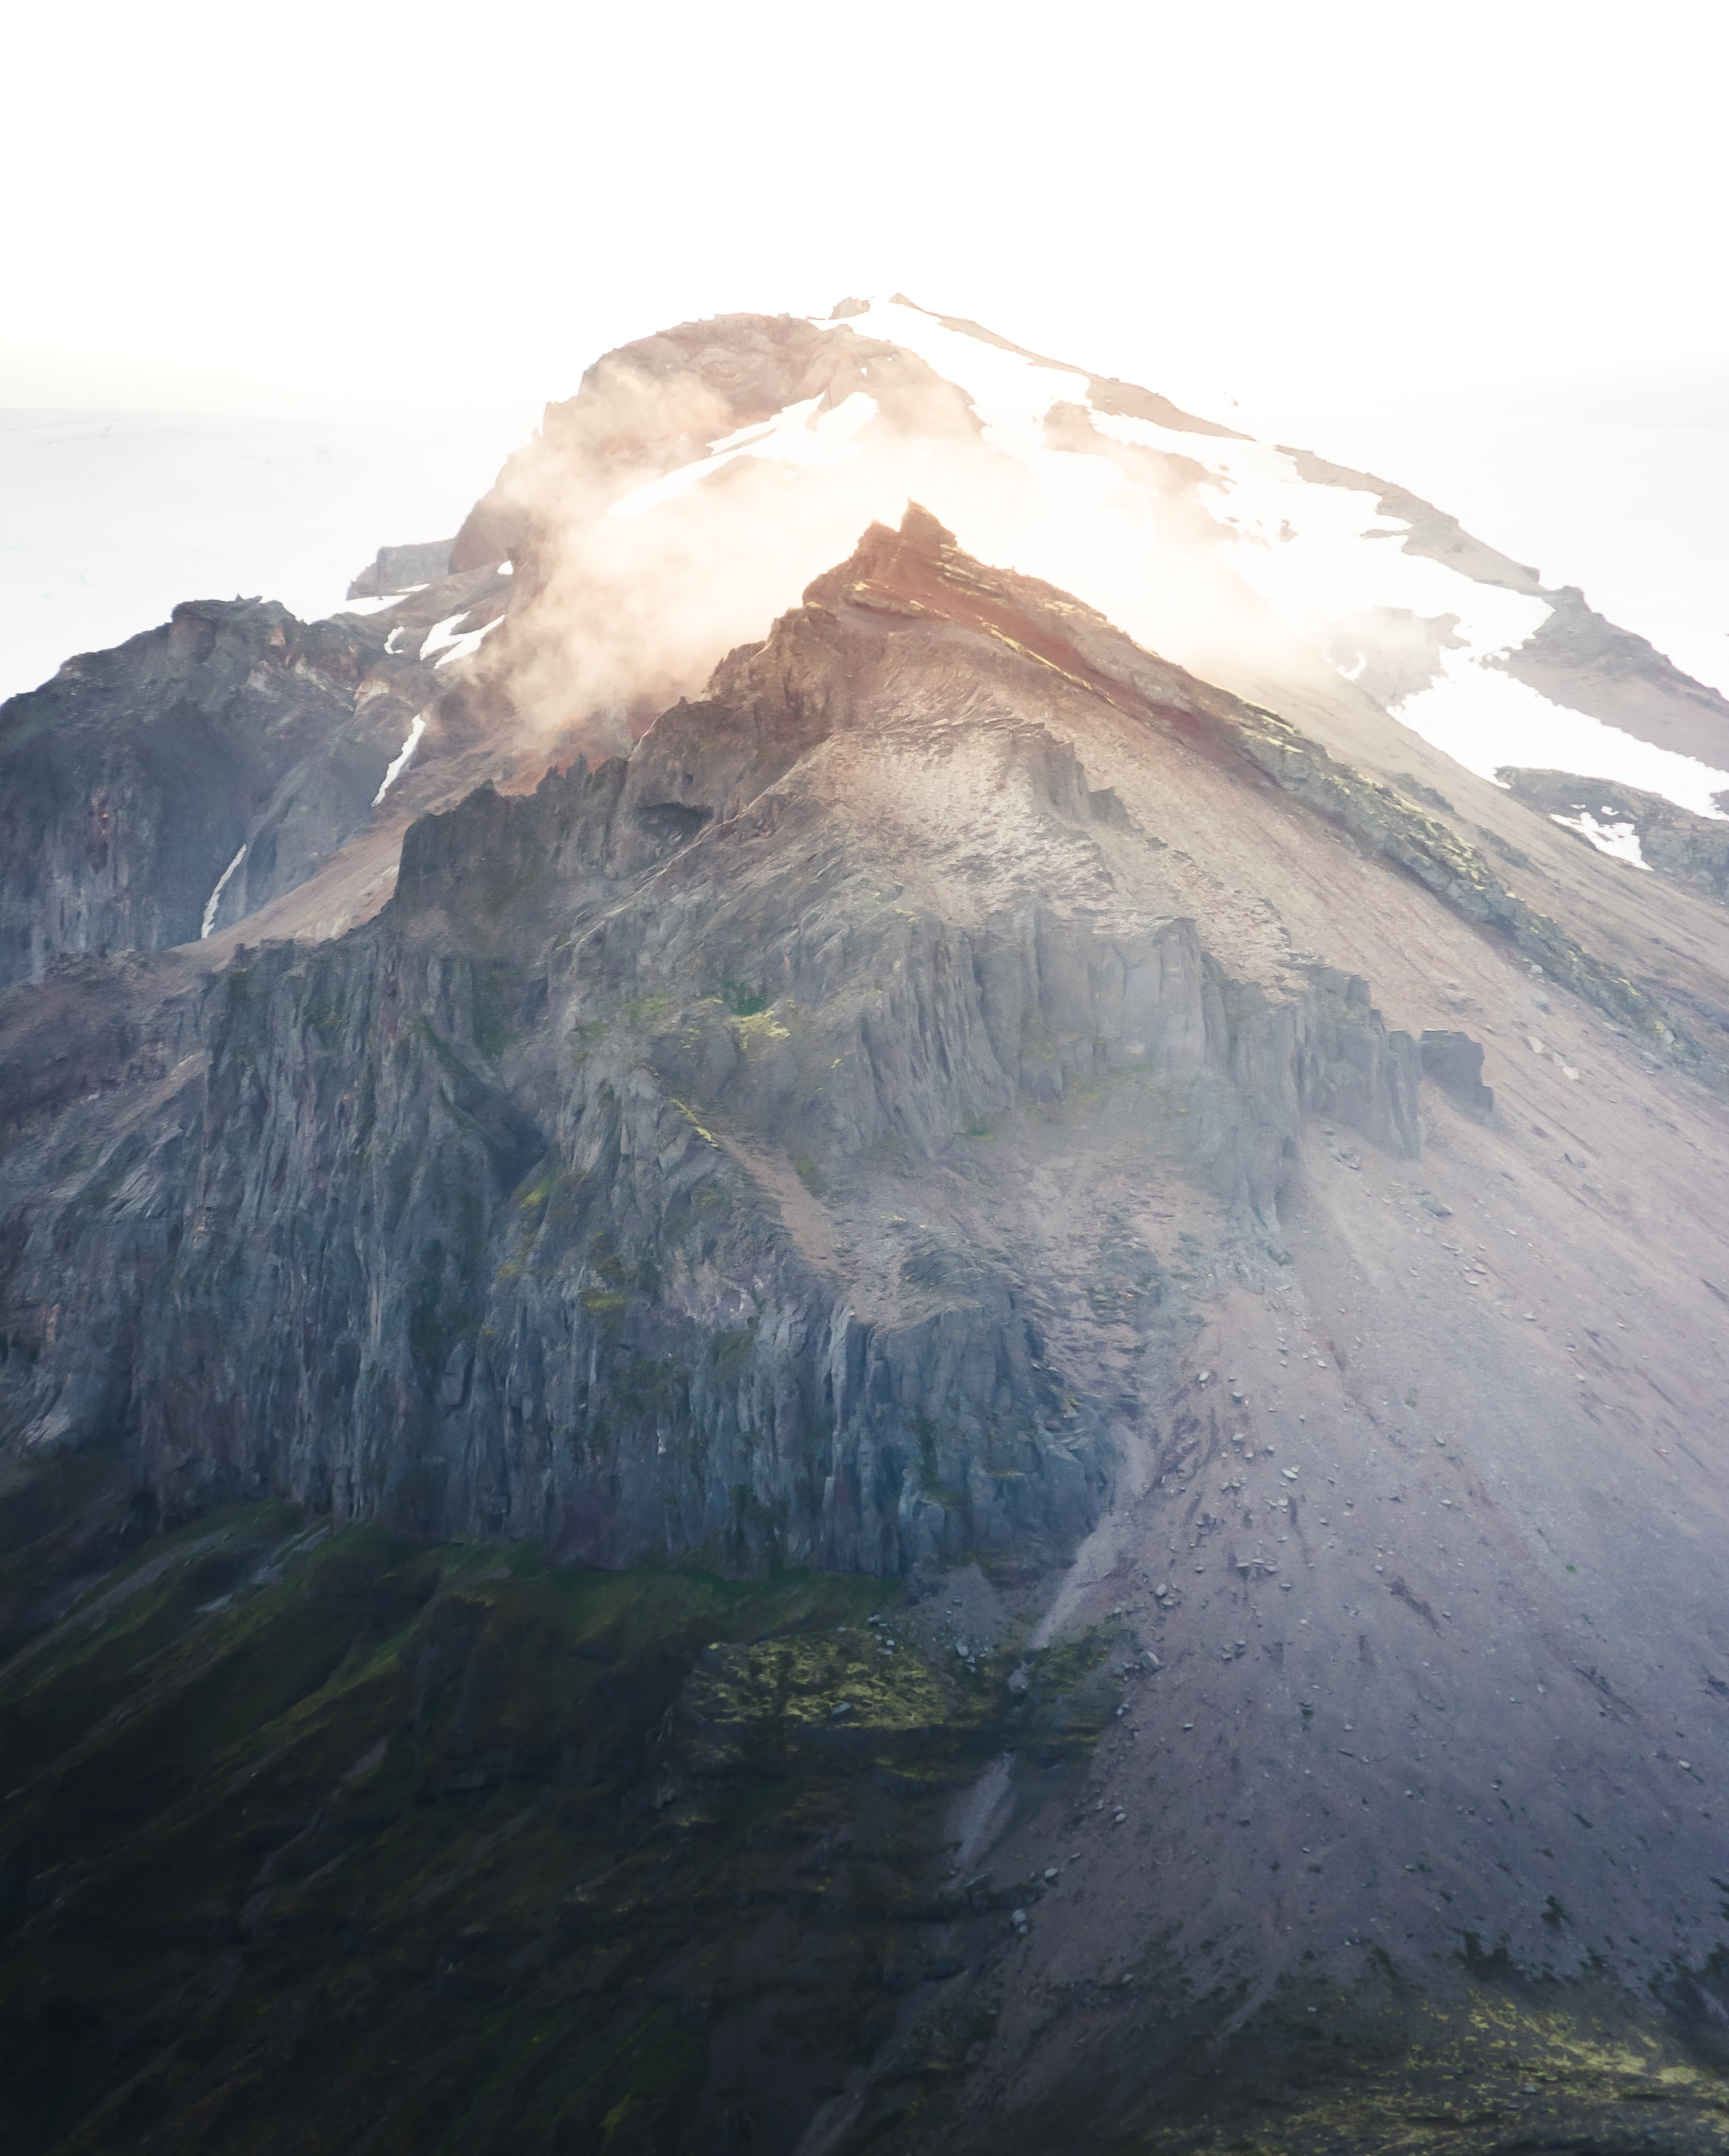 landscape photo of gray mountain